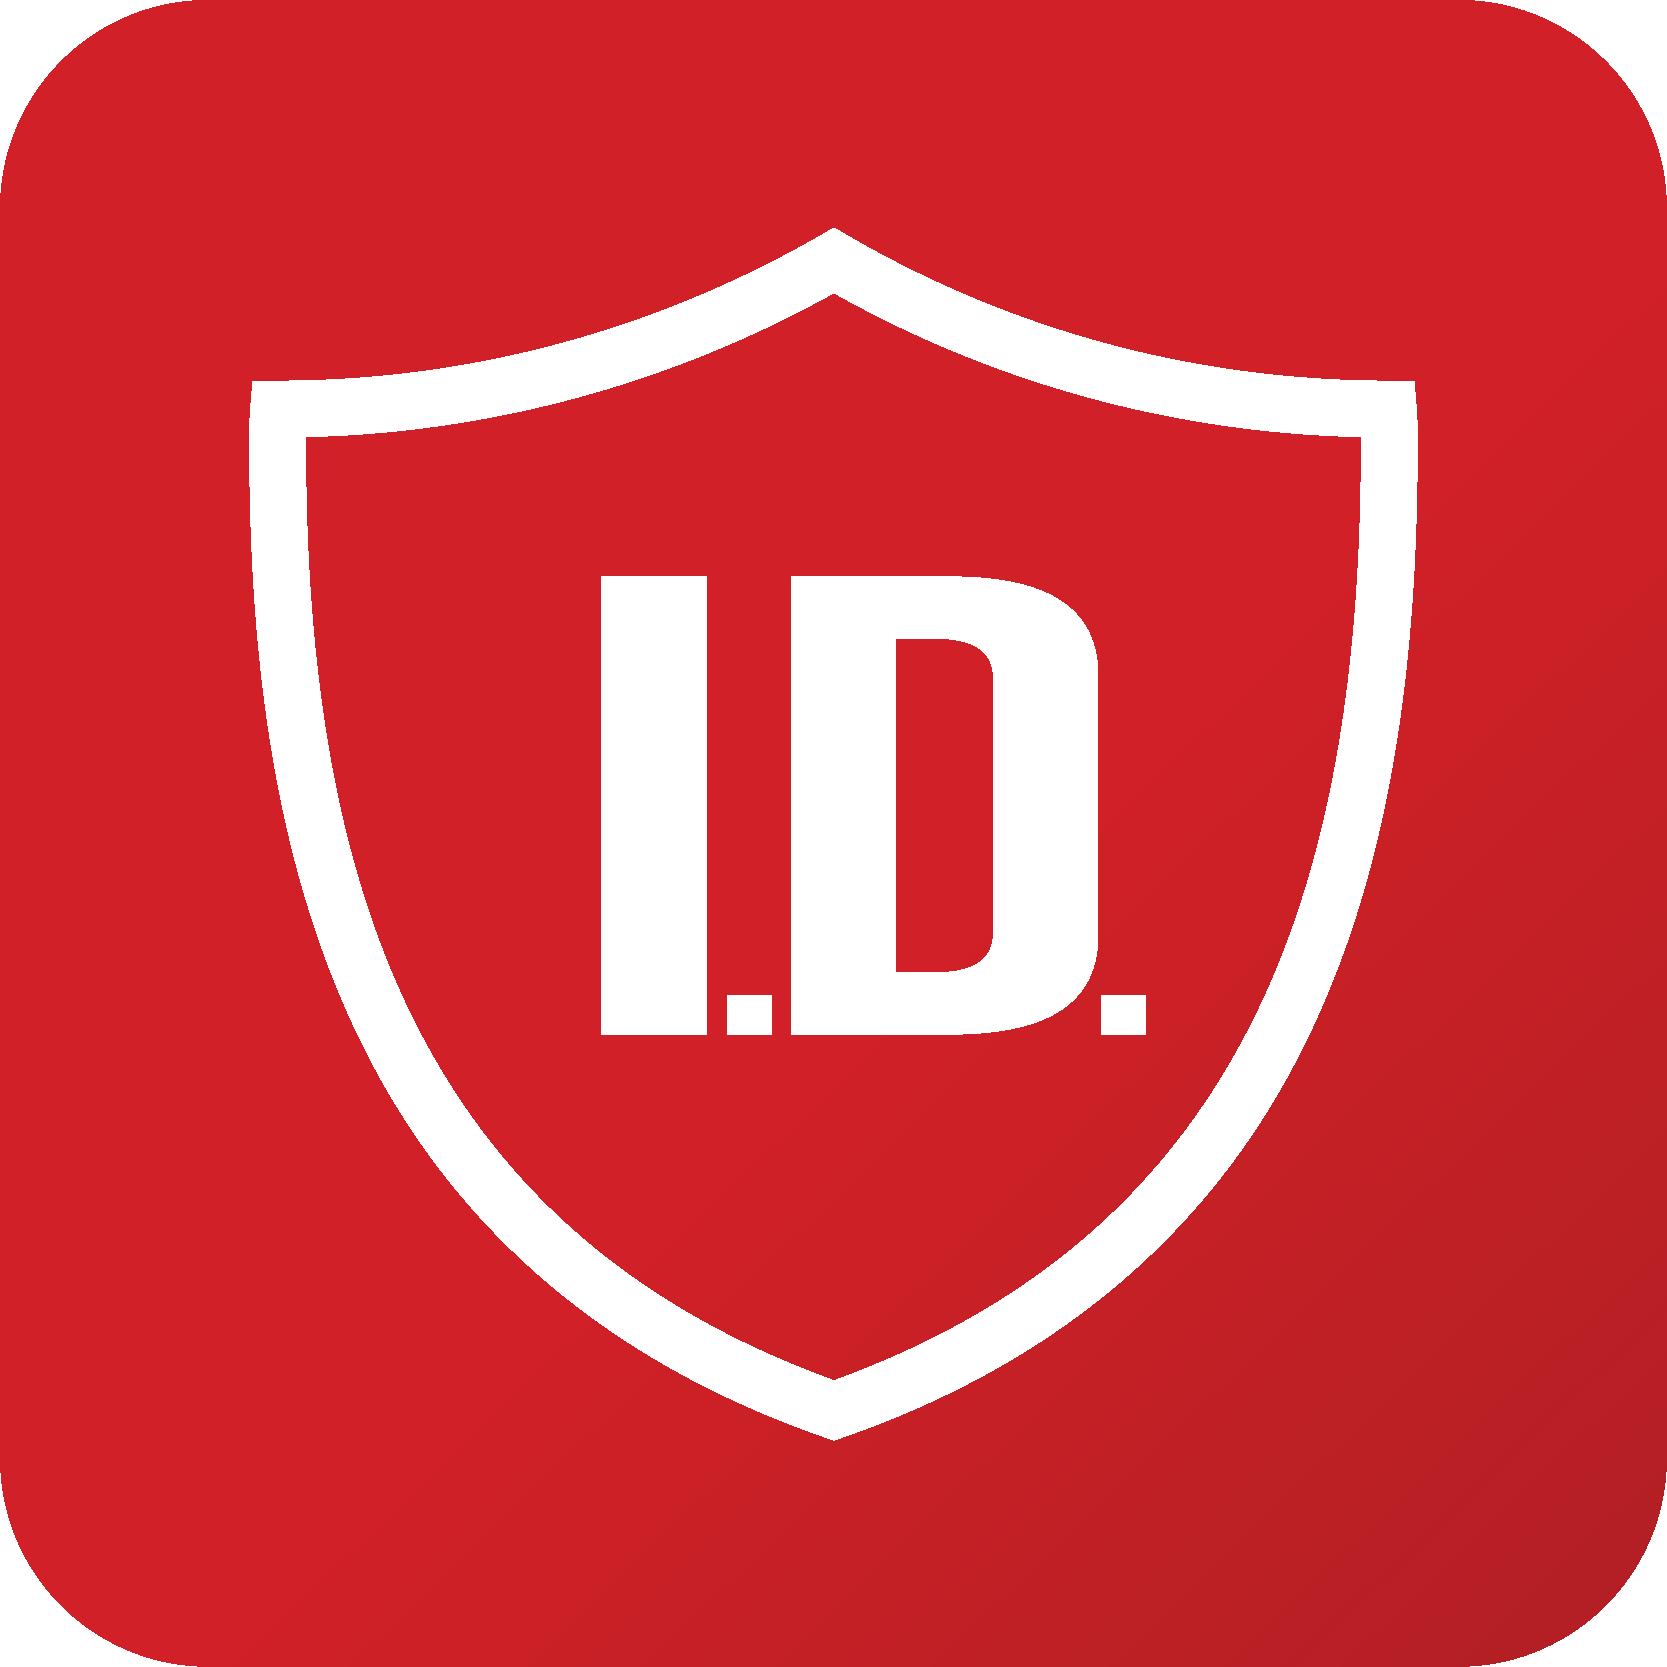 MyUNL ID Password Claim/Reset